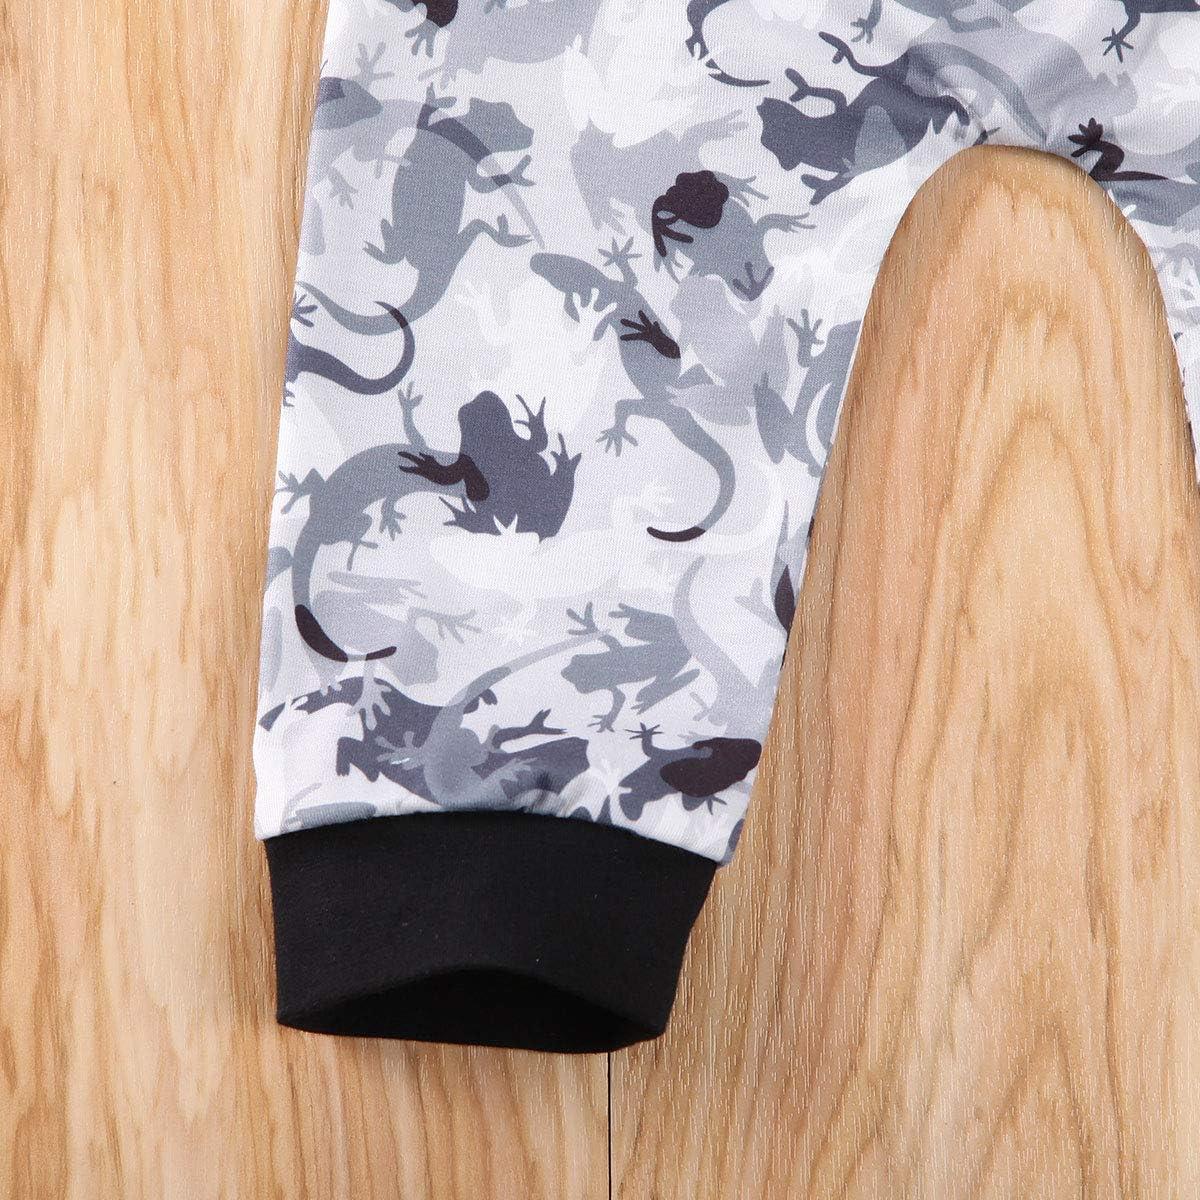 Mioliknya Newborn Baby Boy Dinosaur Print Short Sleeve Pocket Hoodie Top Sweatshirts+Long Pants 2Pcs Infant Summer Outfits